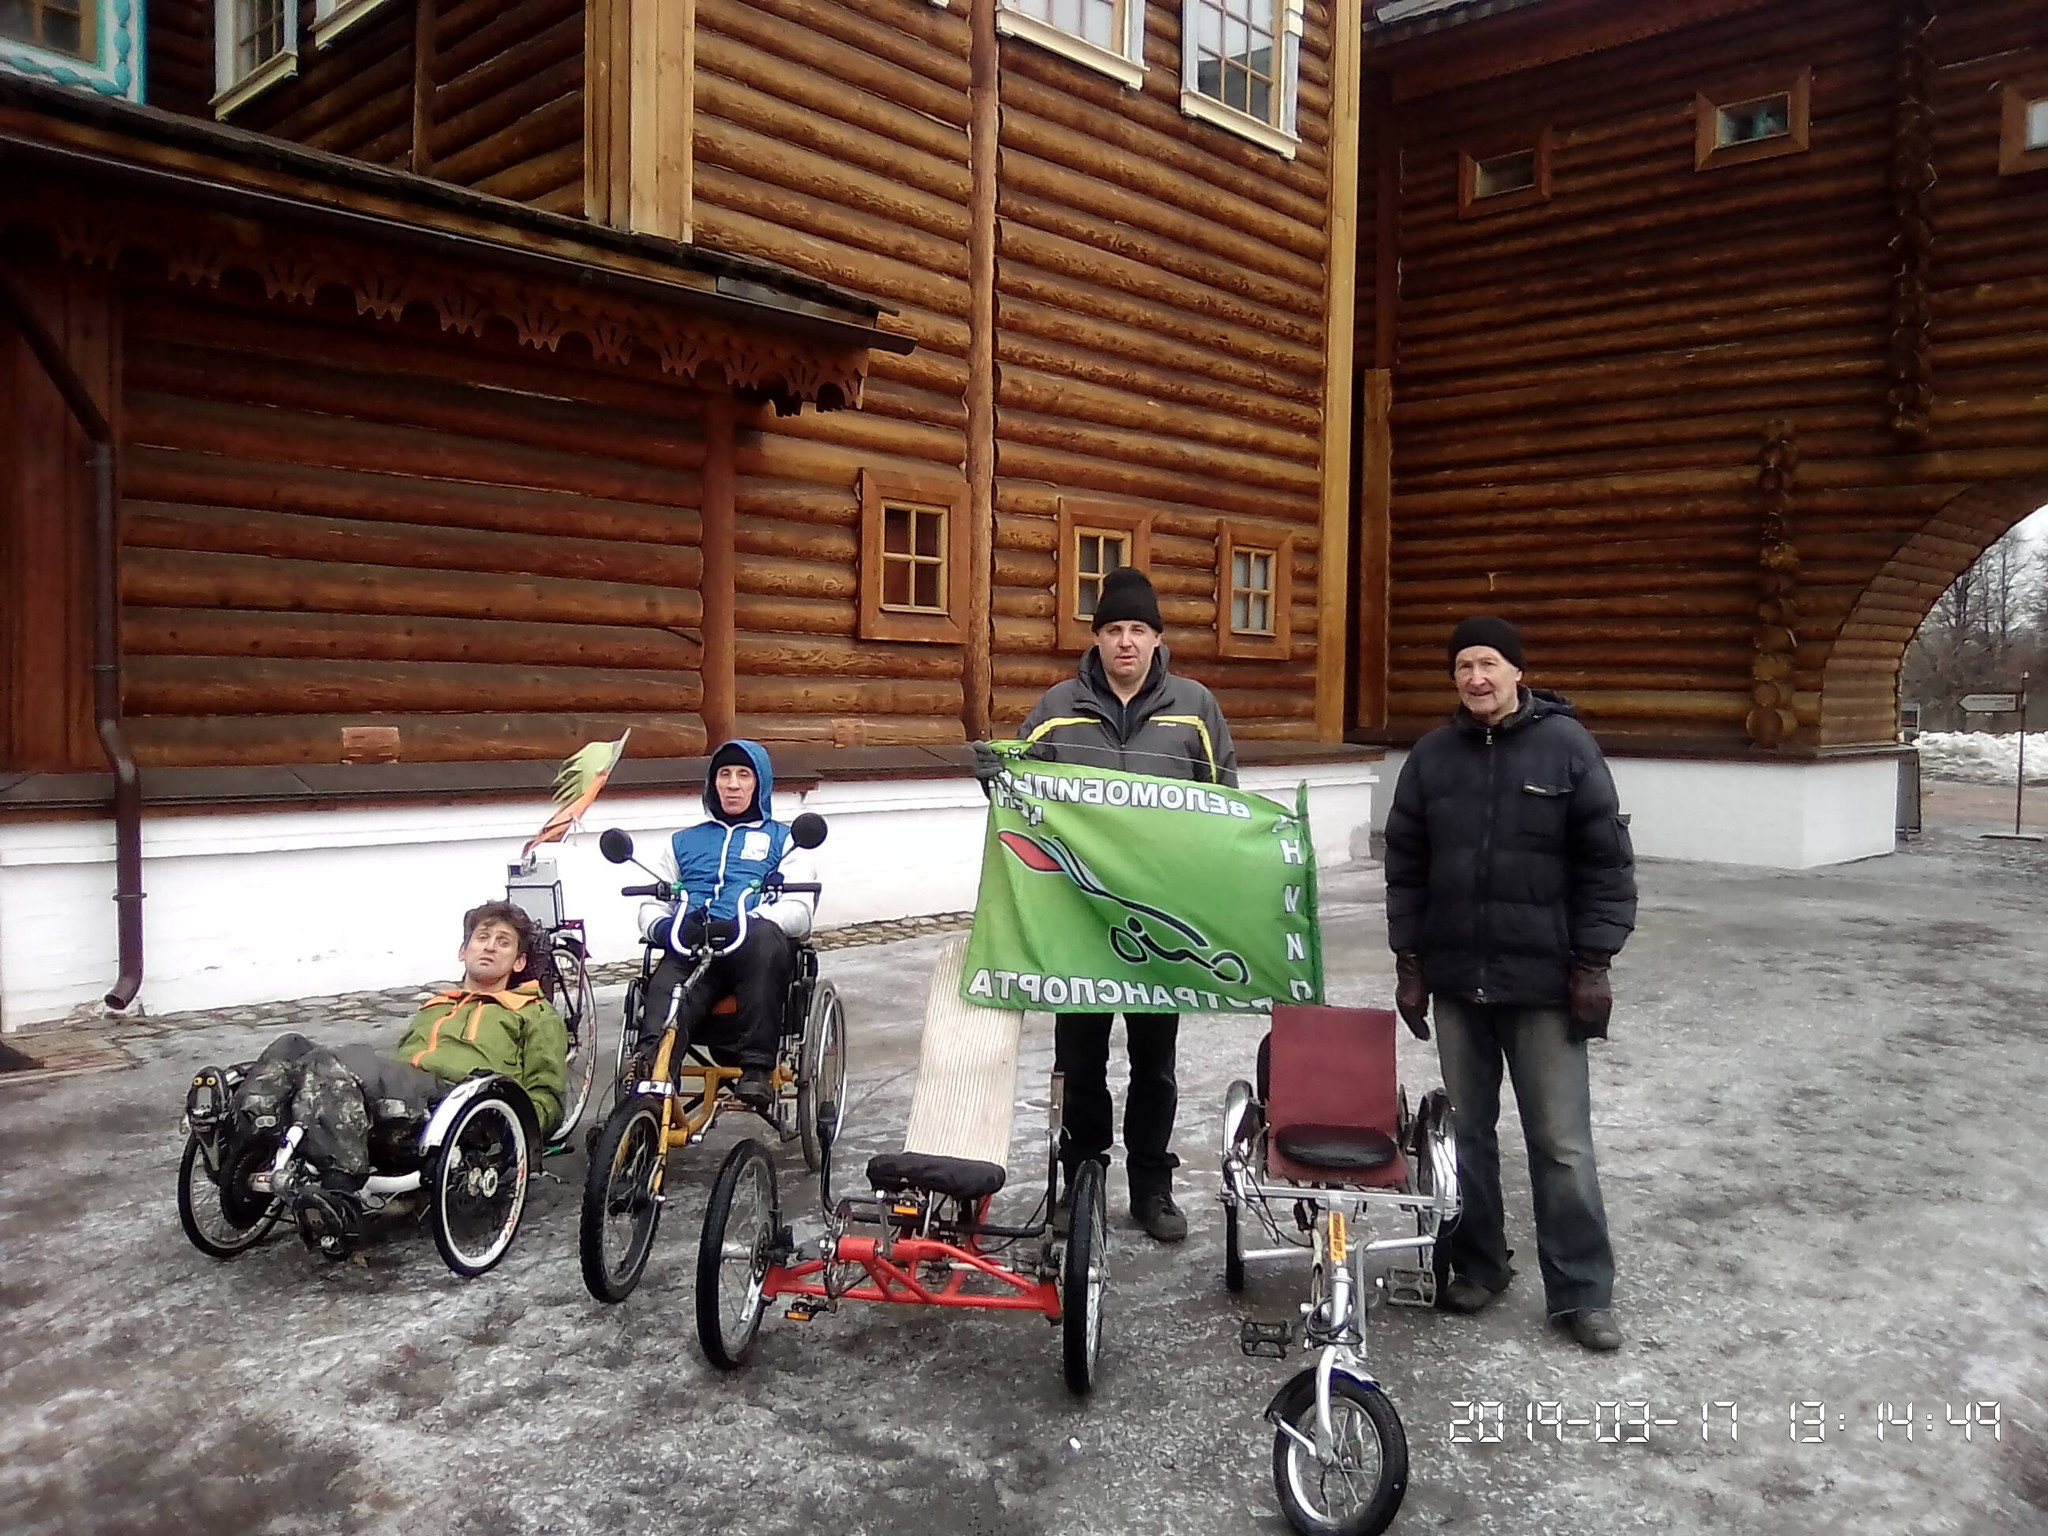 https://content.foto.my.mail.ru/list/maxnev/syzdalchev/h-306.jpg